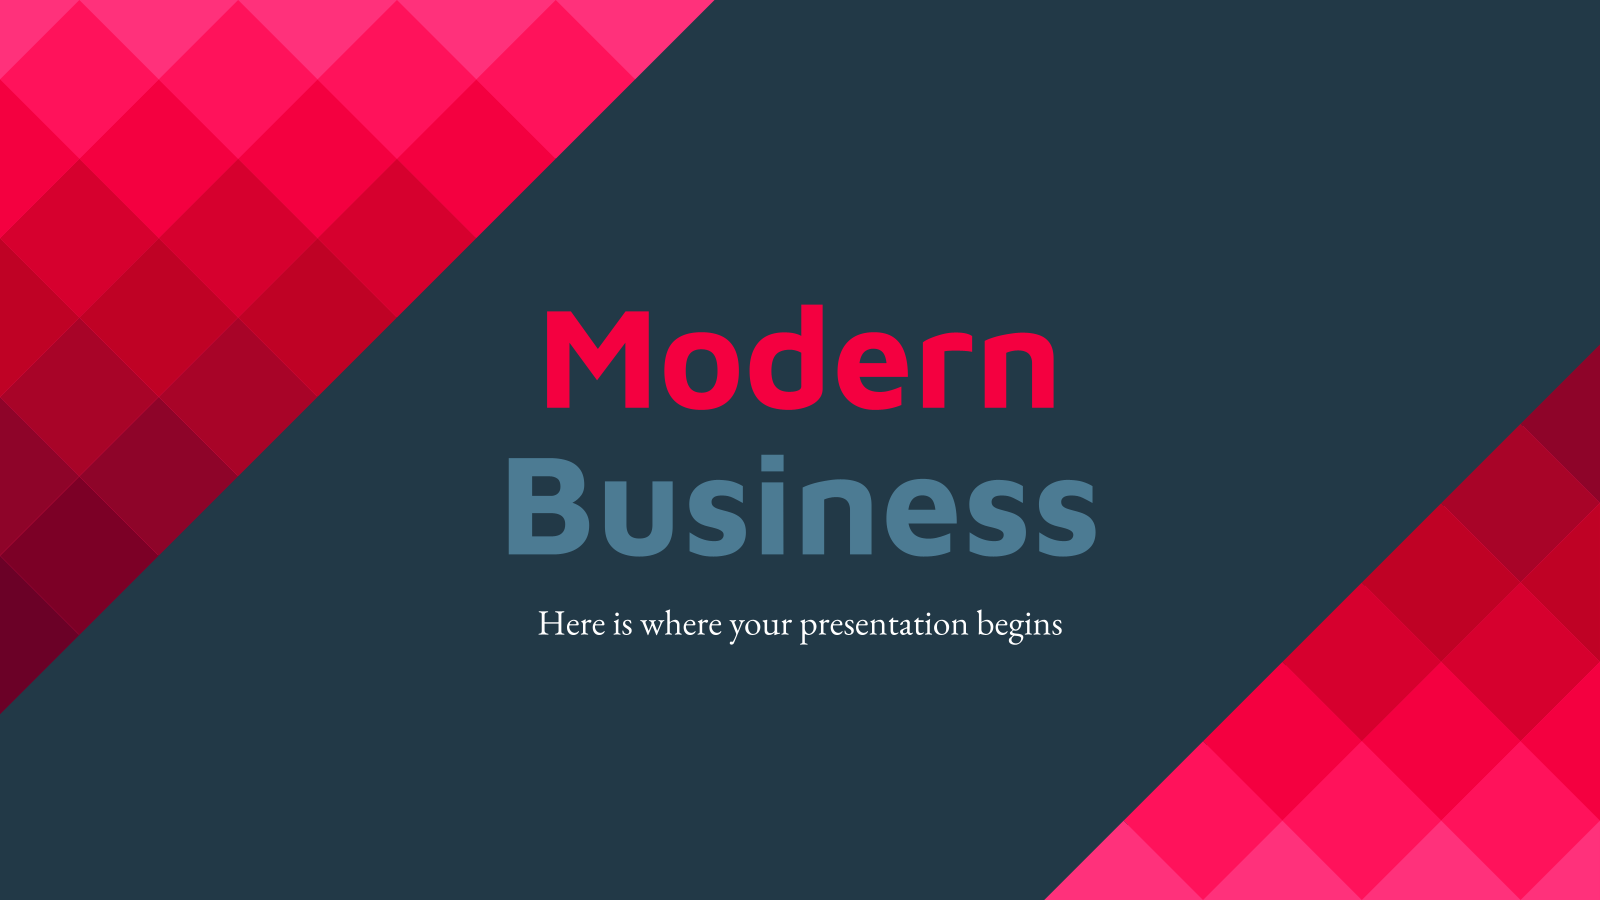 Plantilla de presentación Negocio moderno